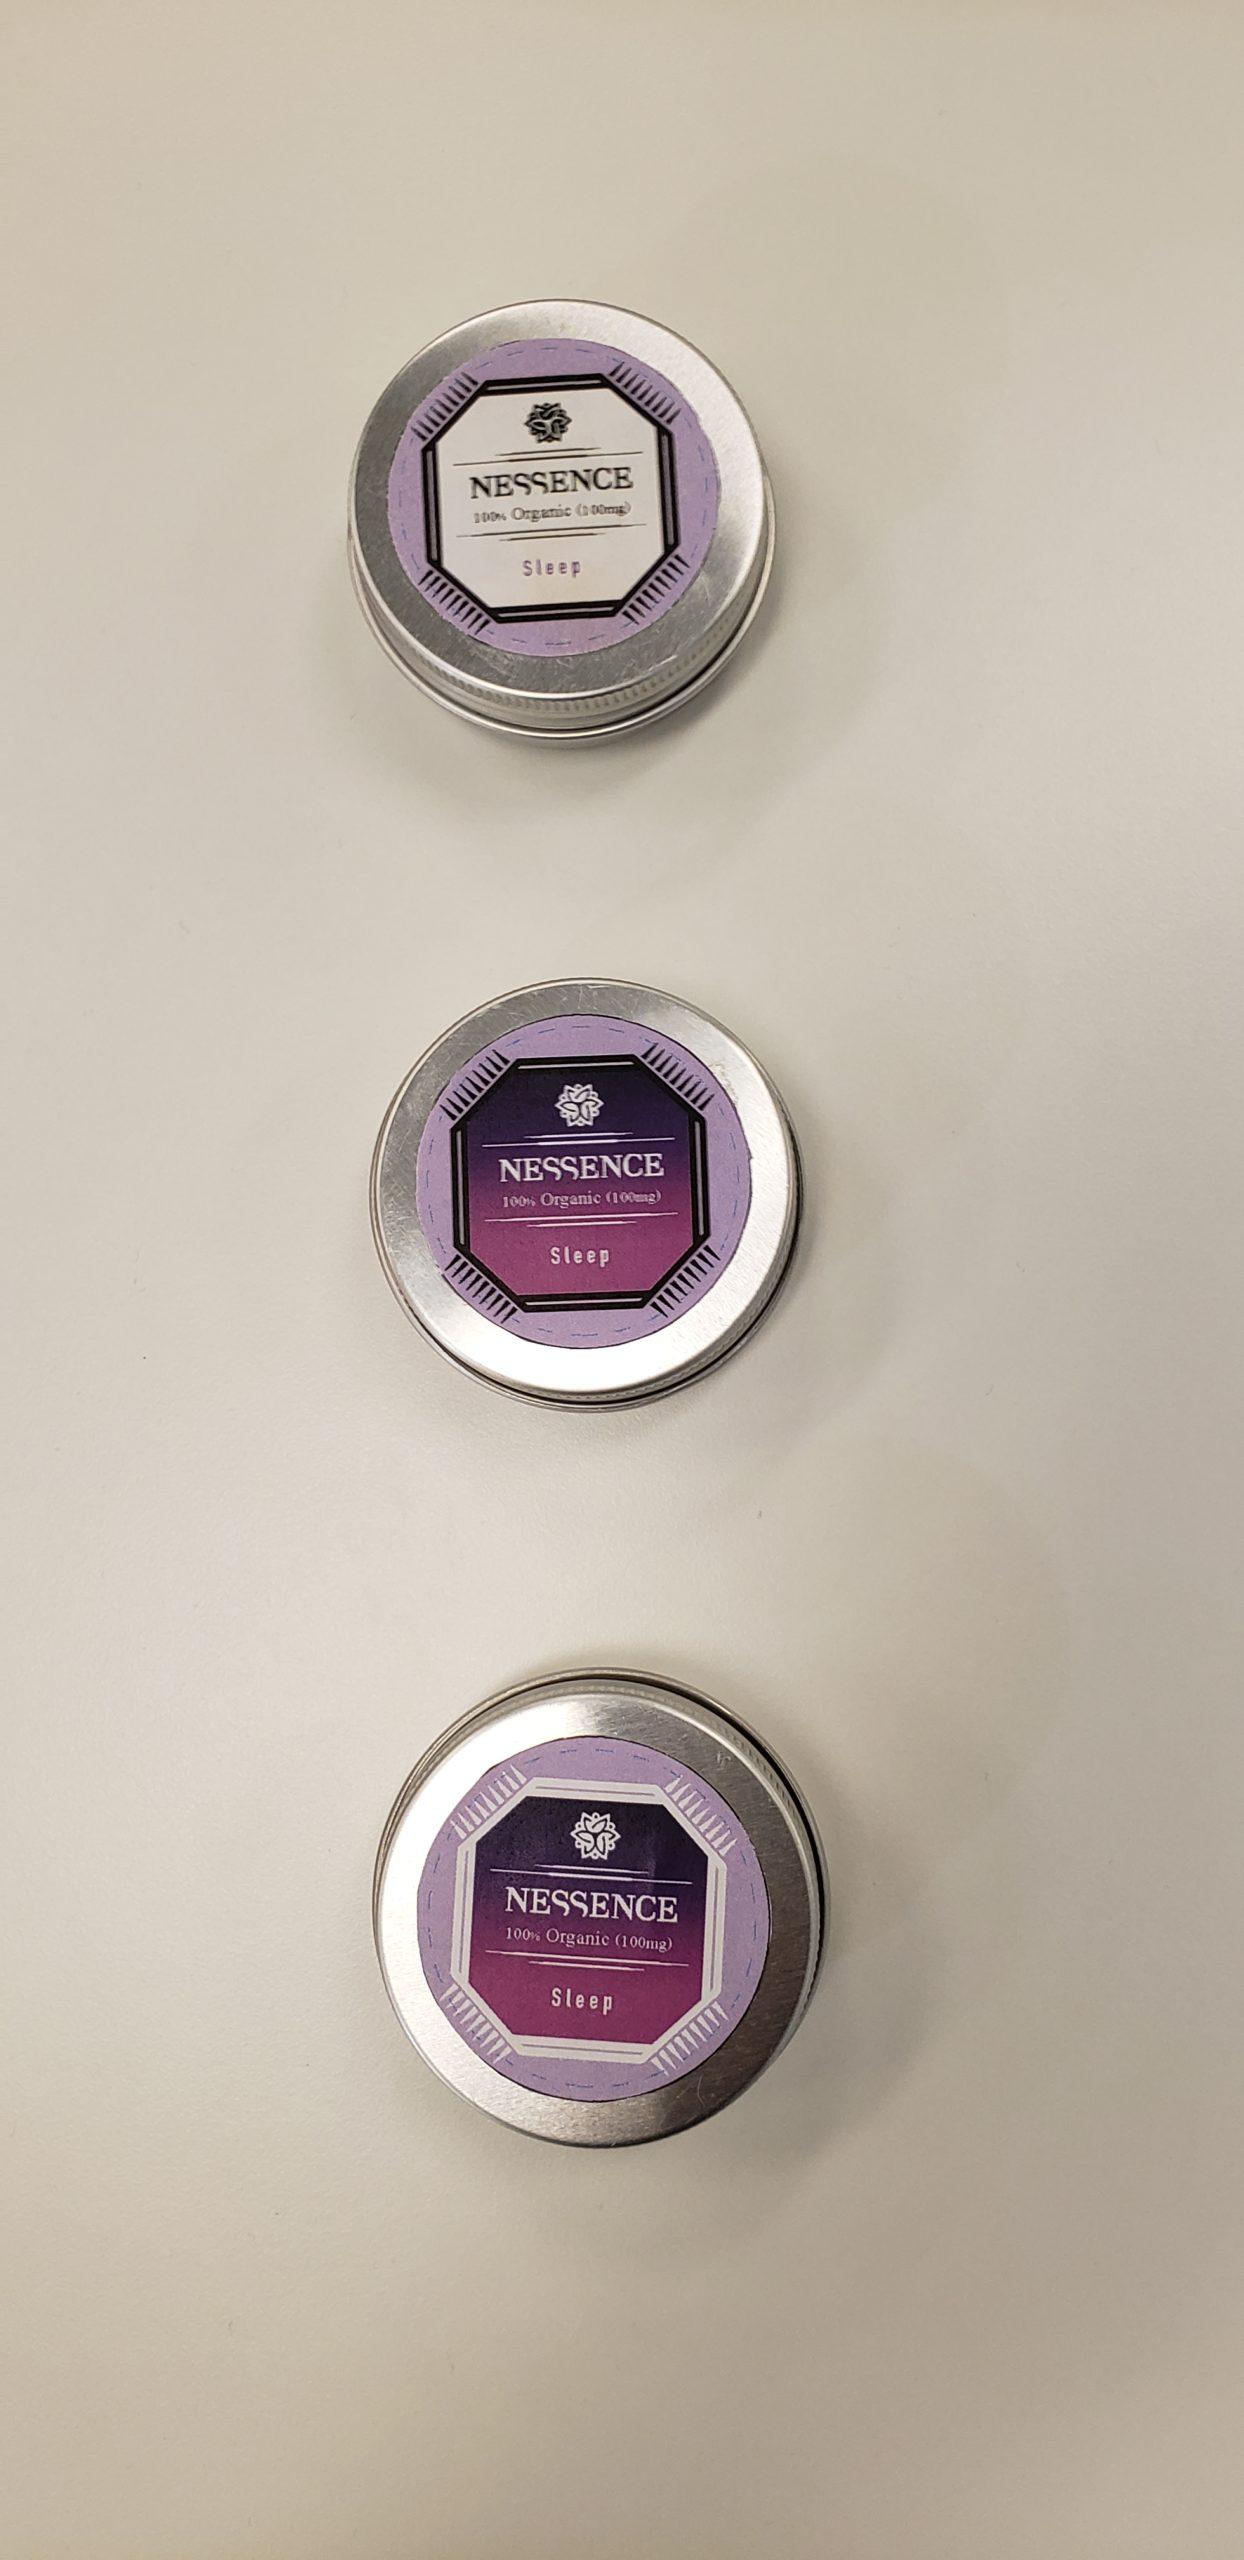 Image of CBD labels